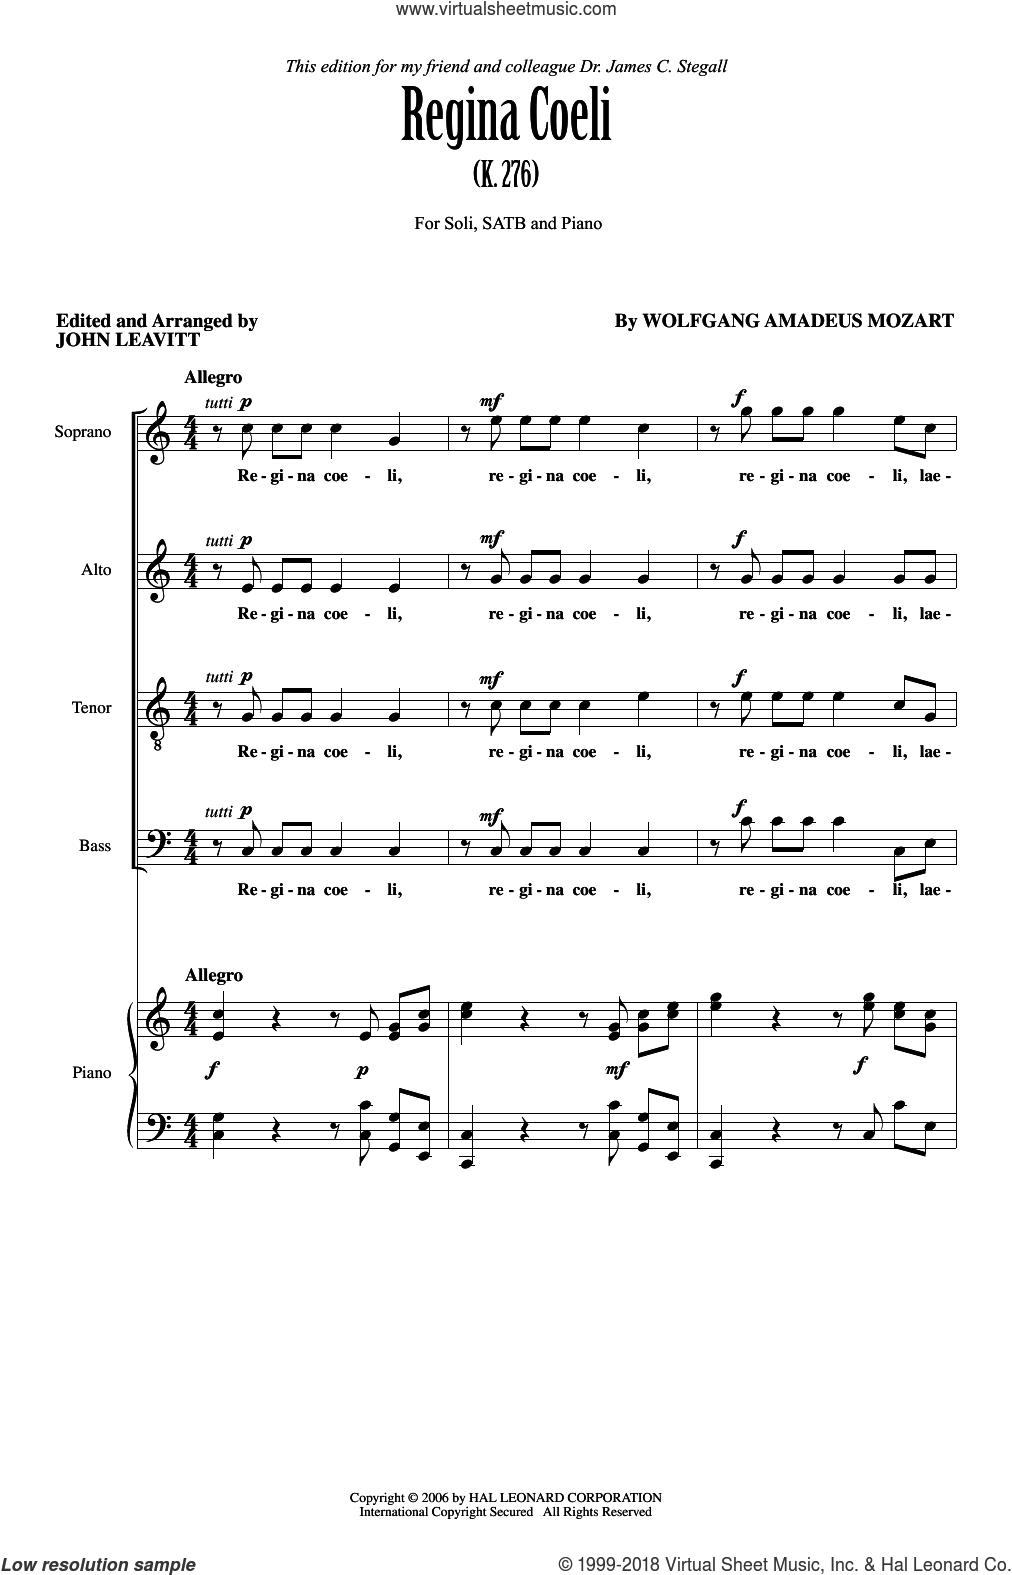 Regina Coeli KV276 sheet music for choir (SATB: soprano, alto, tenor, bass) by Wolfgang Amadeus Mozart and John Leavitt, intermediate skill level